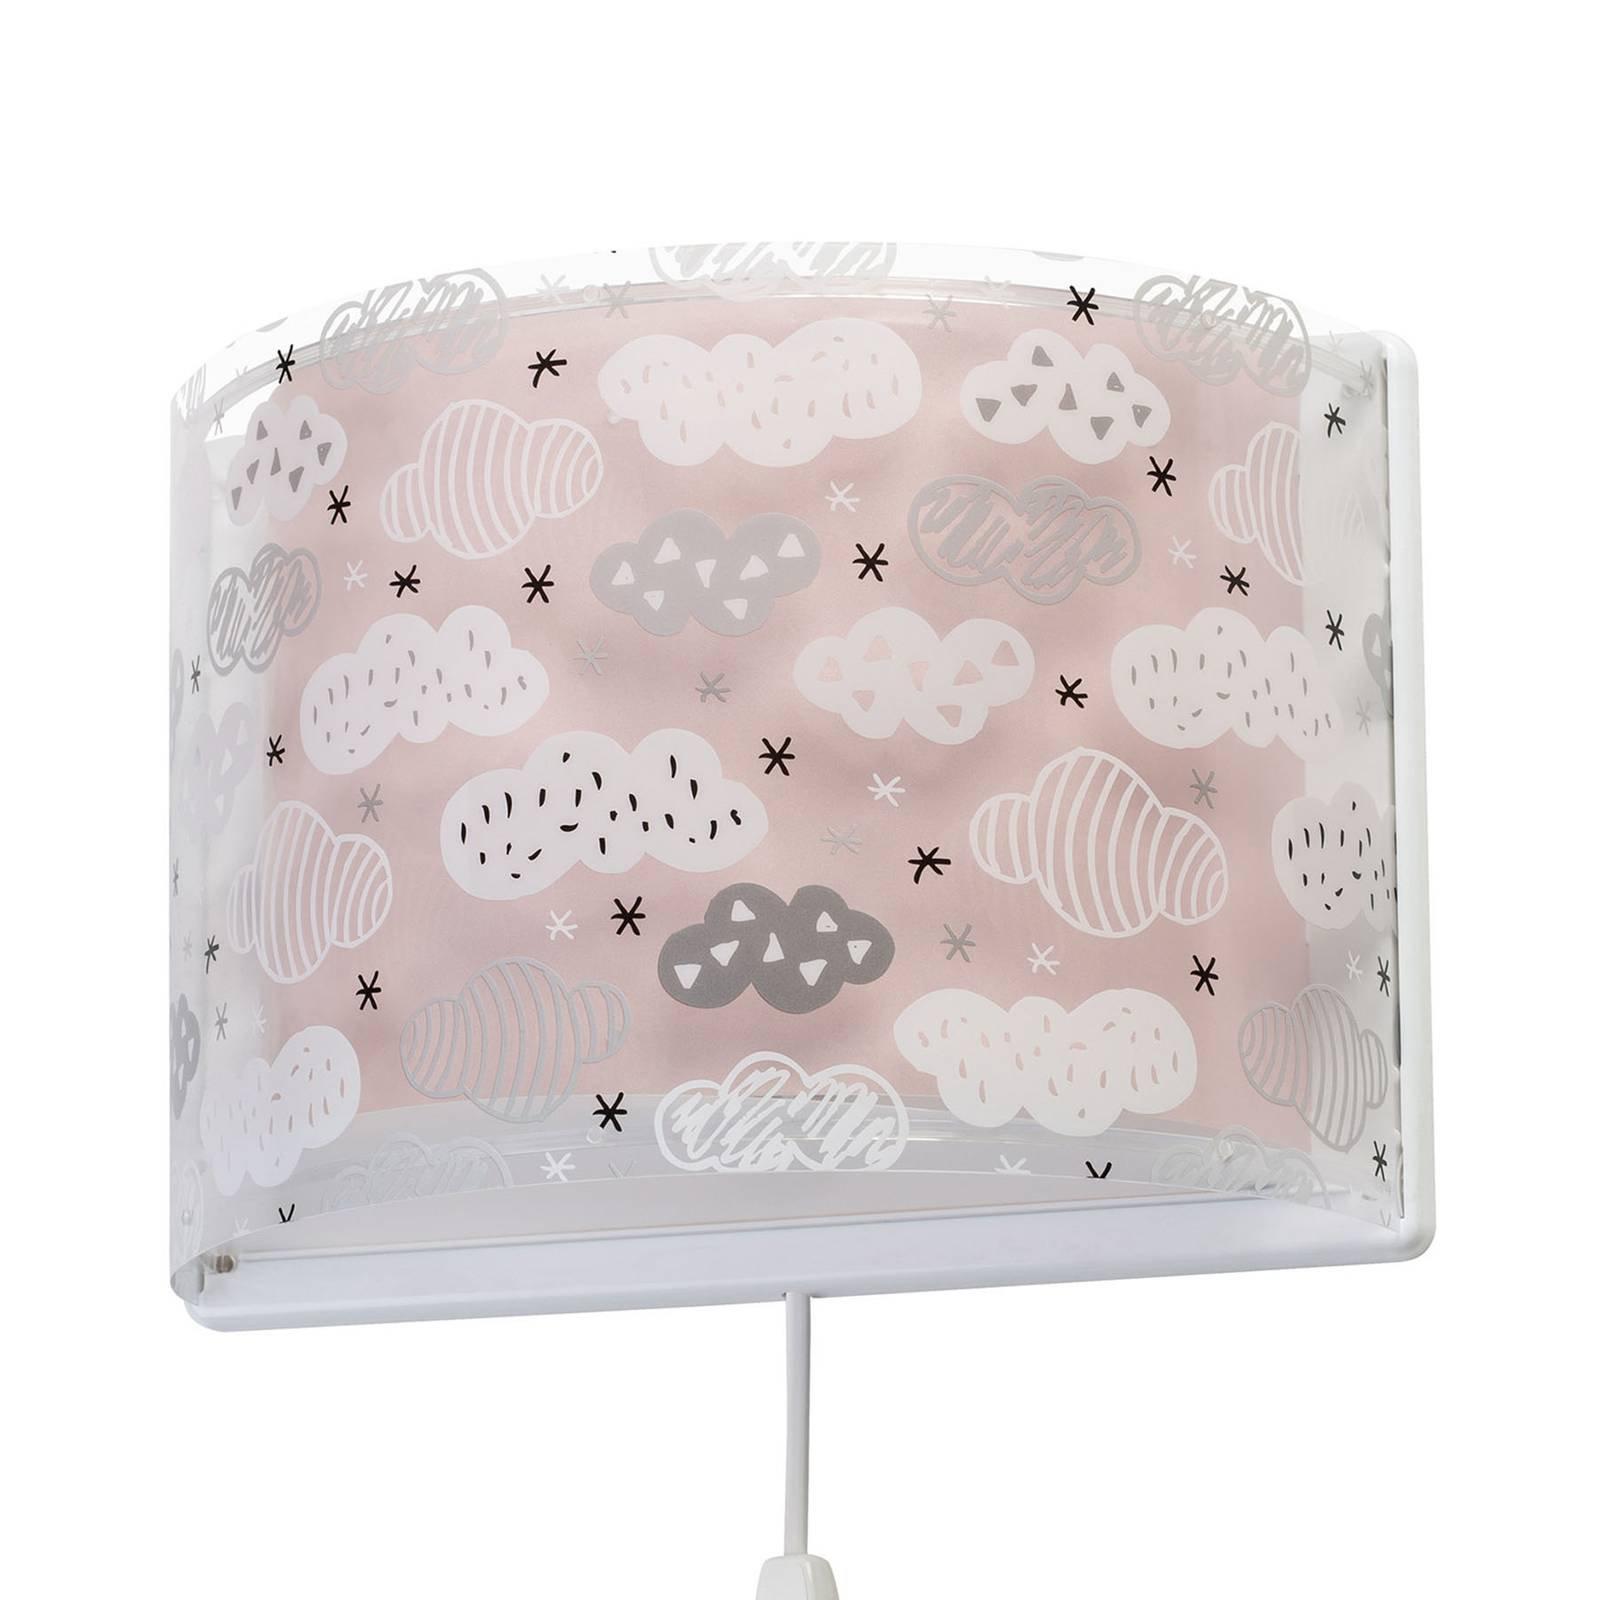 Barne-vegglampe Clouds i rosa